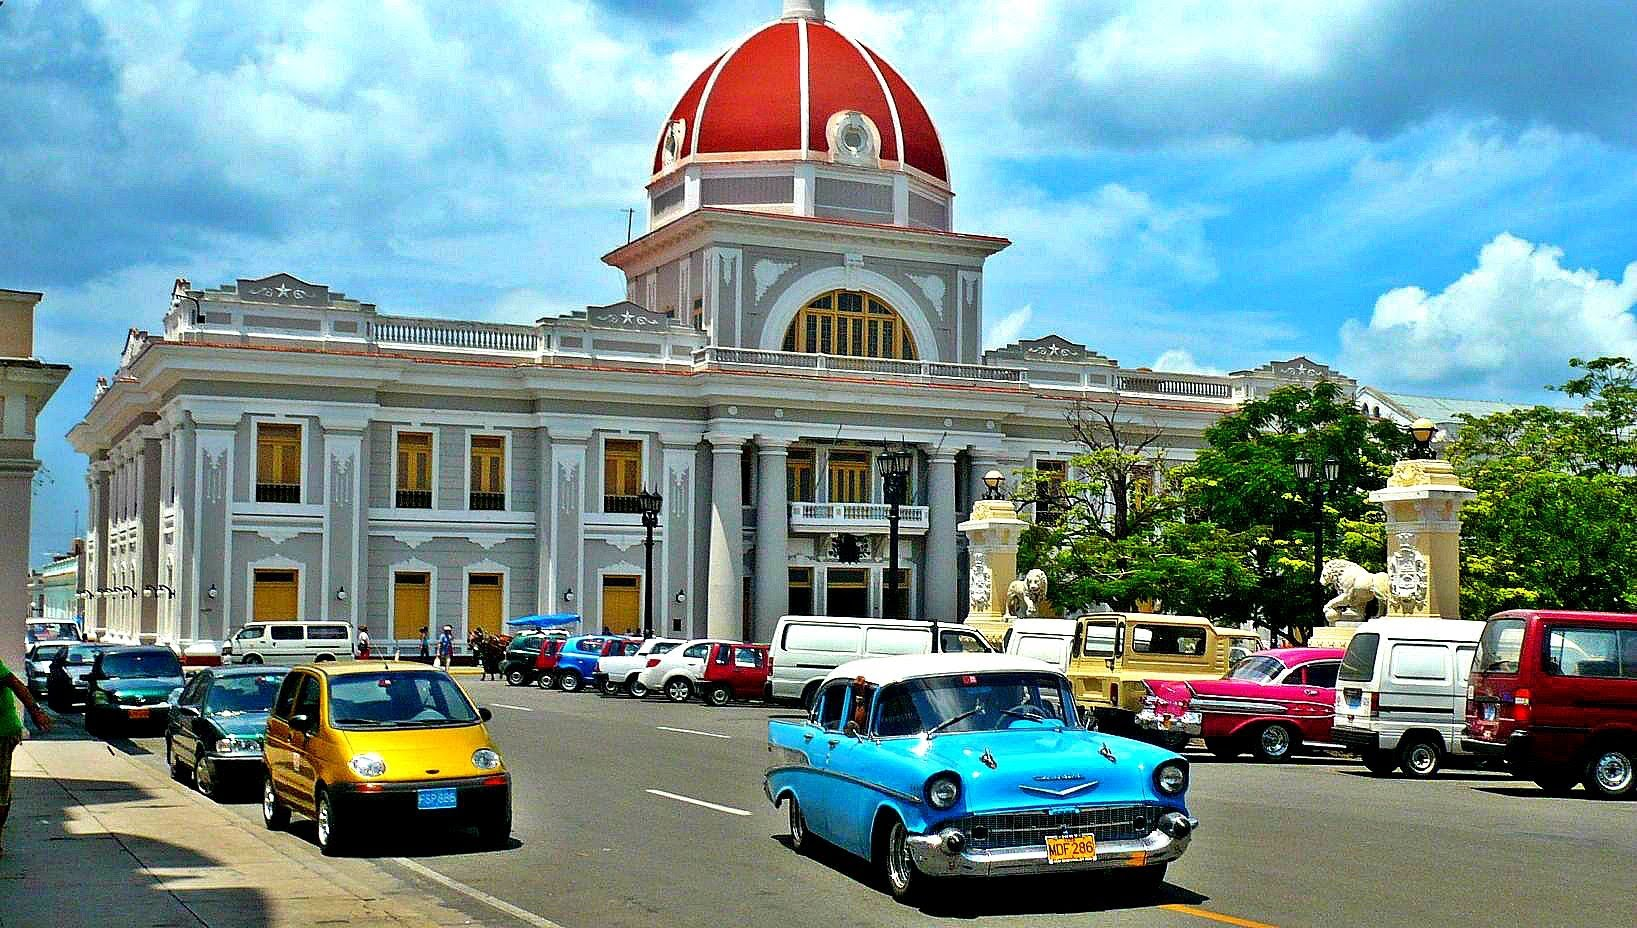 Oferta viaje a la Habana